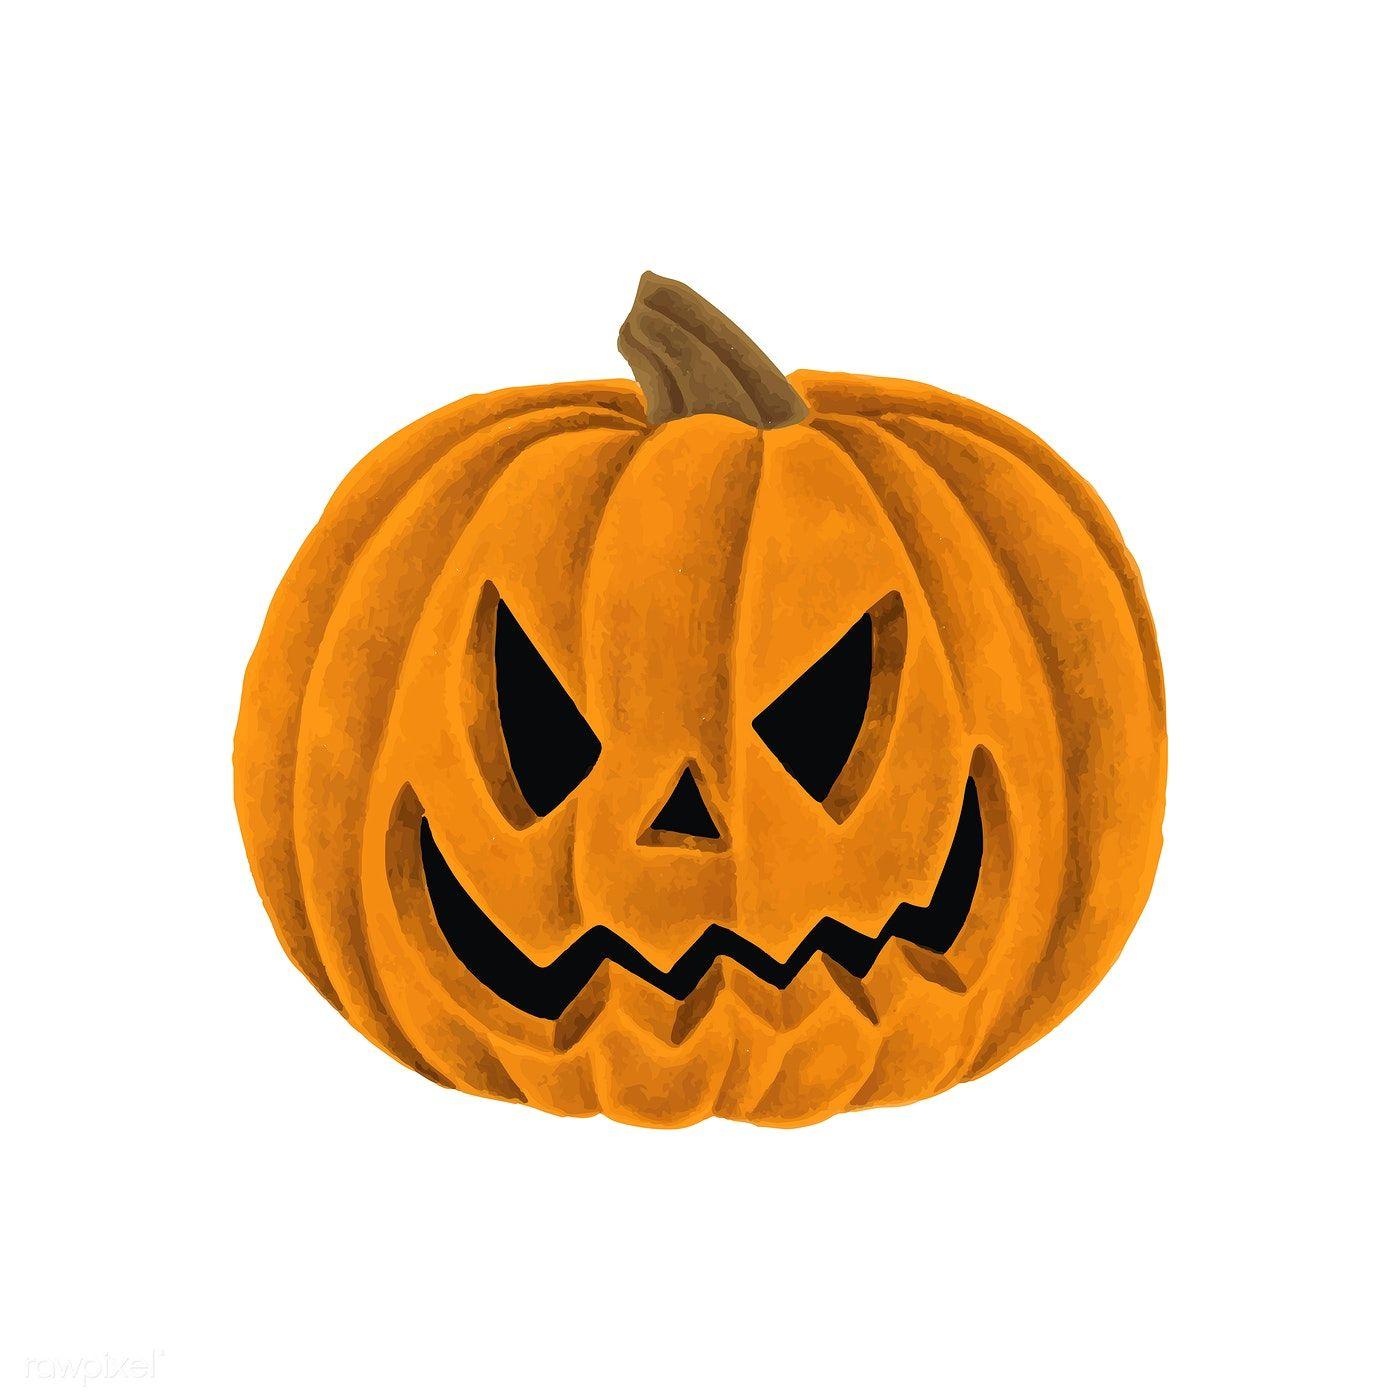 Hand drawn Halloween pumpkin jacko'lantern free image